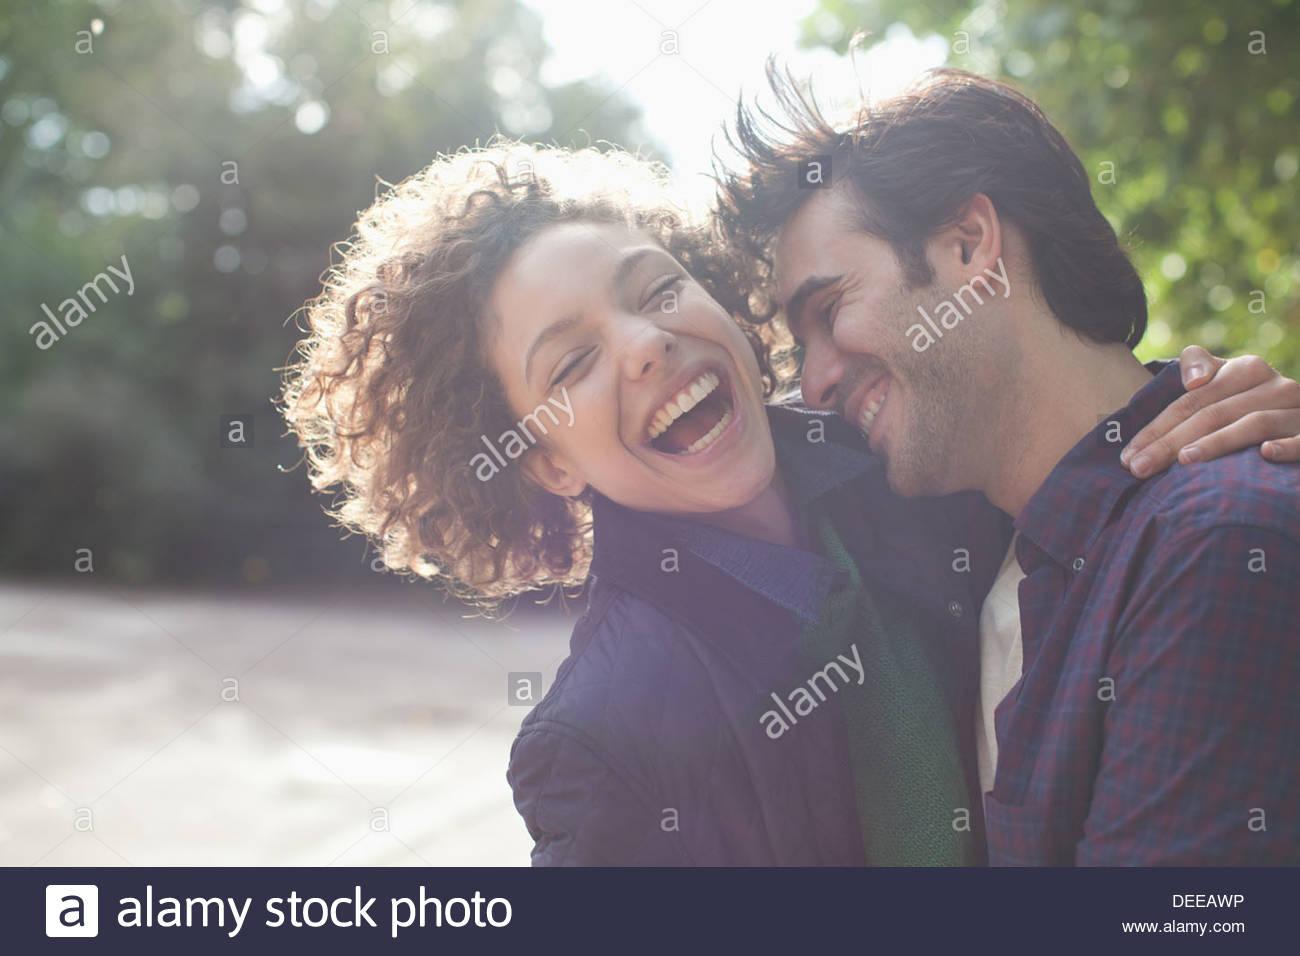 Cerrar hasta risa par abrazos Imagen De Stock